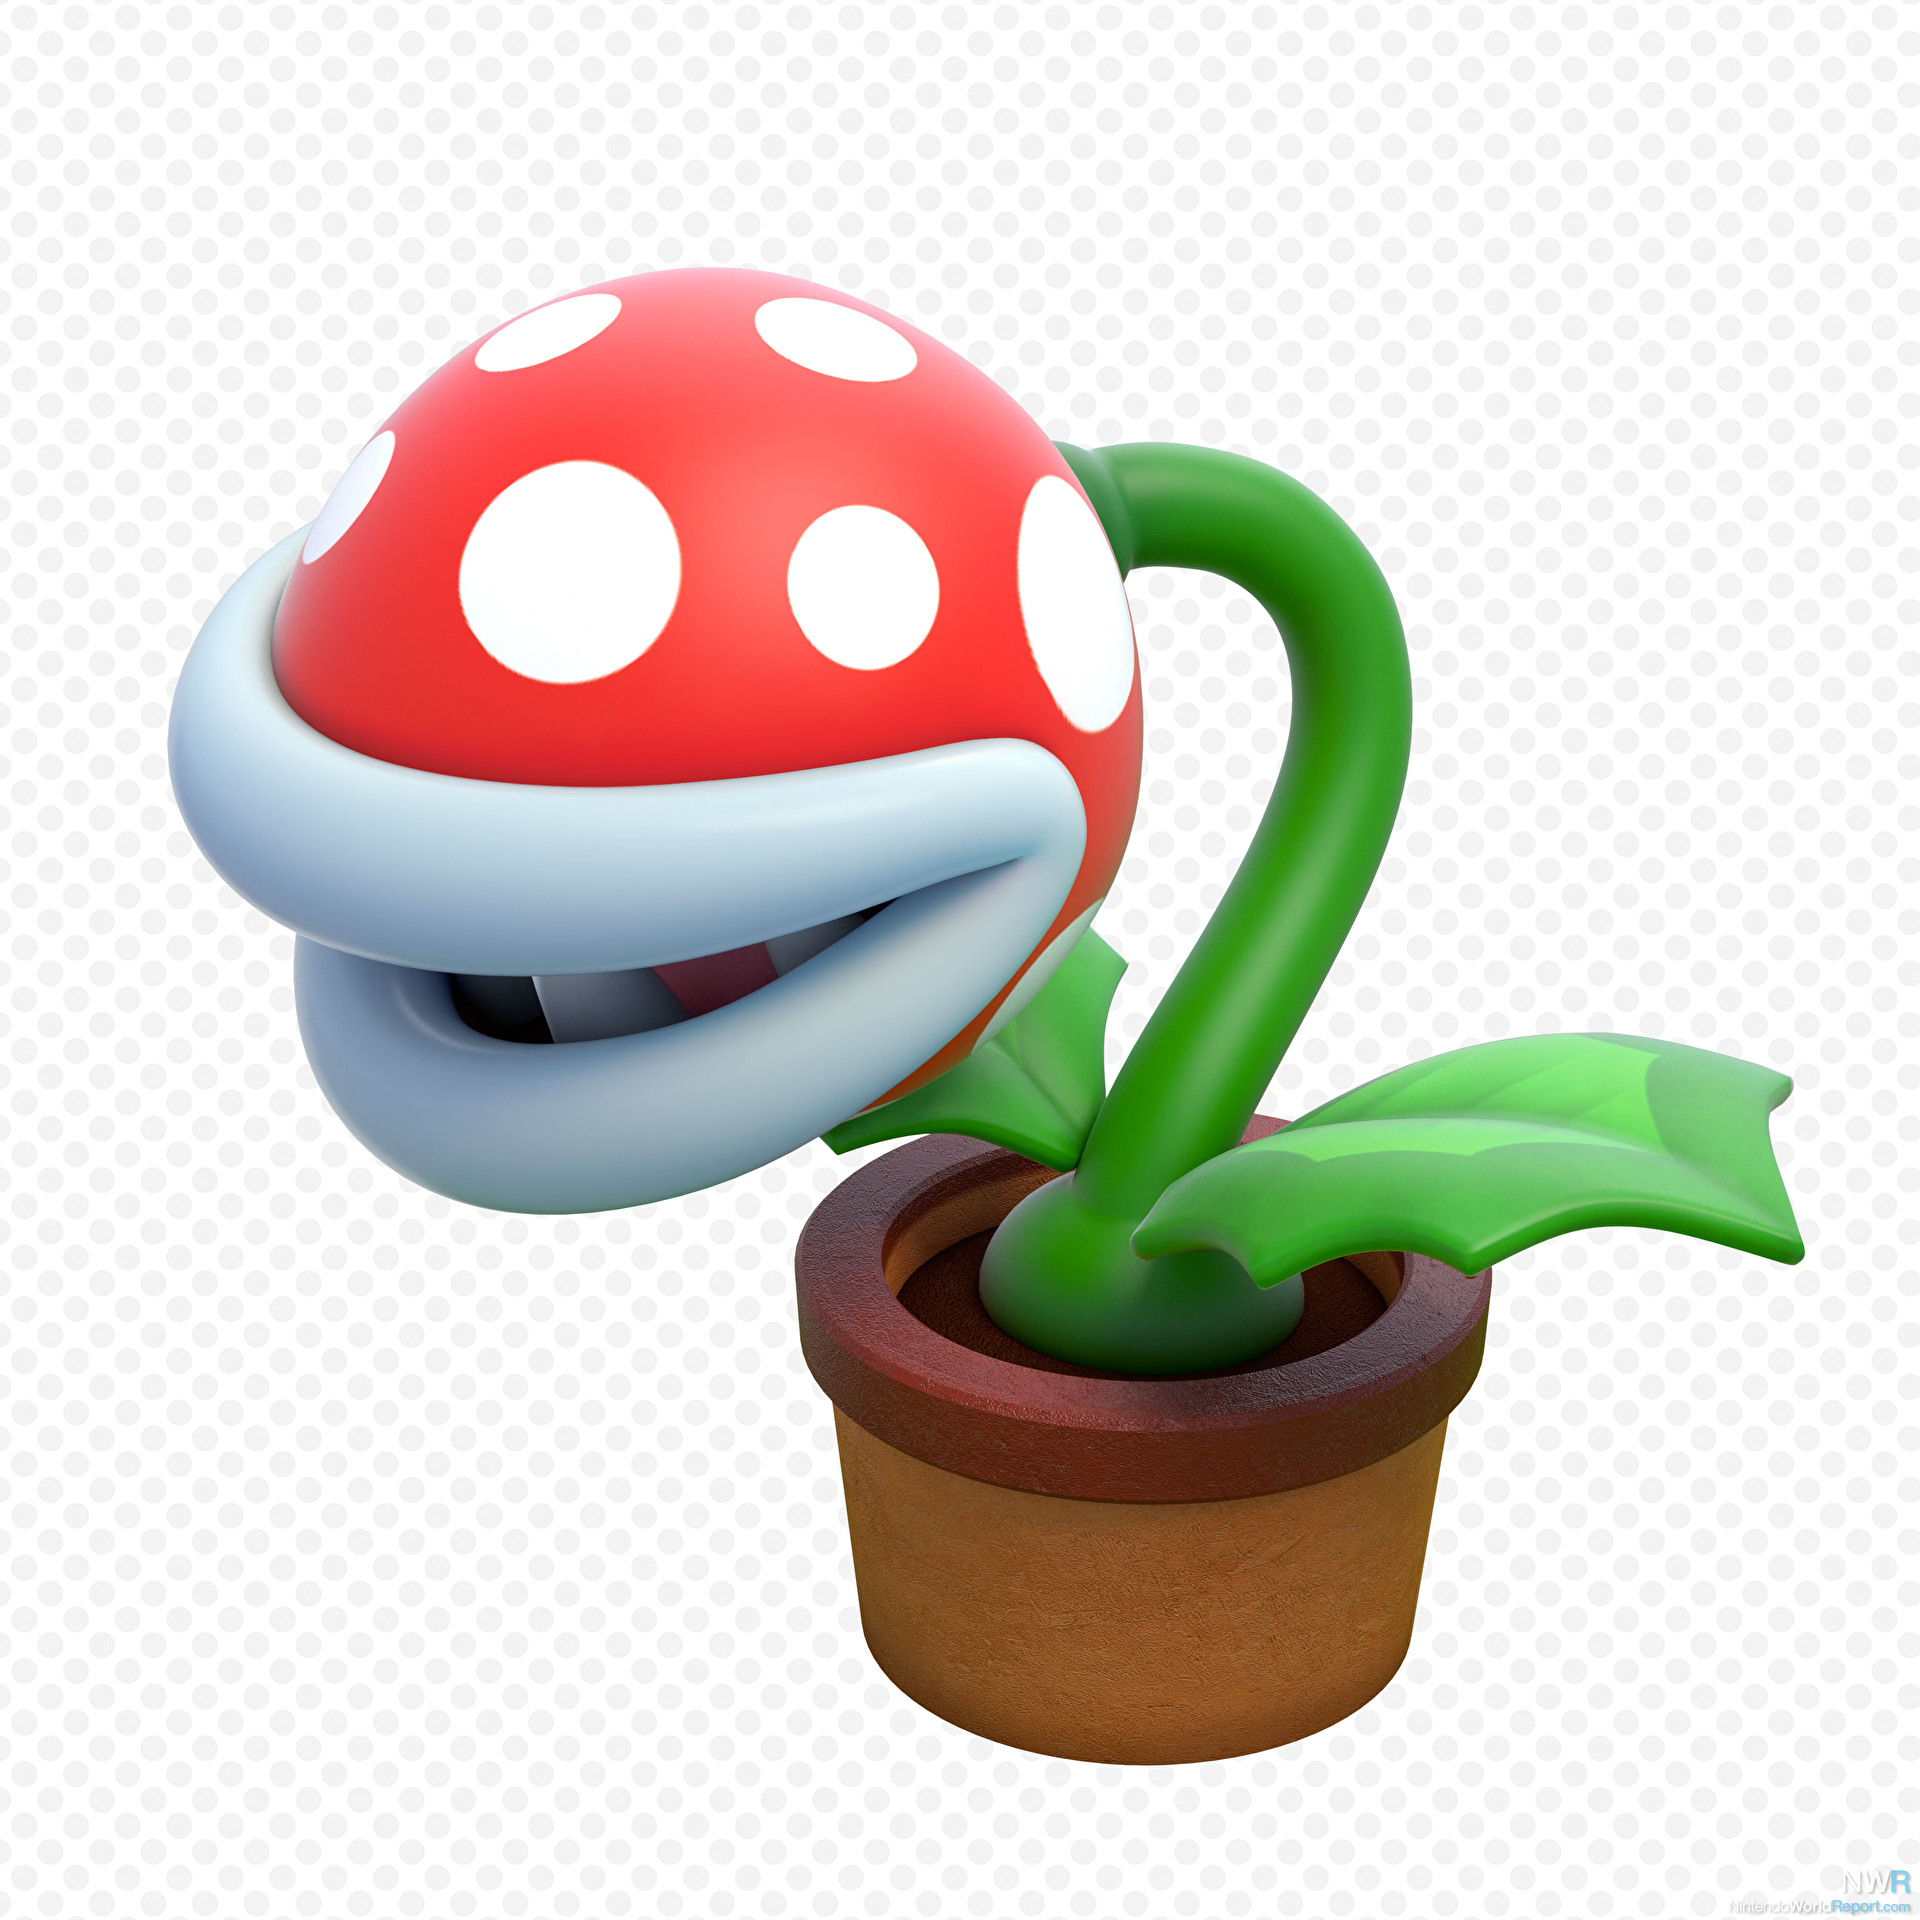 Mario clipart piranha plant Search piranha Google Pink plant